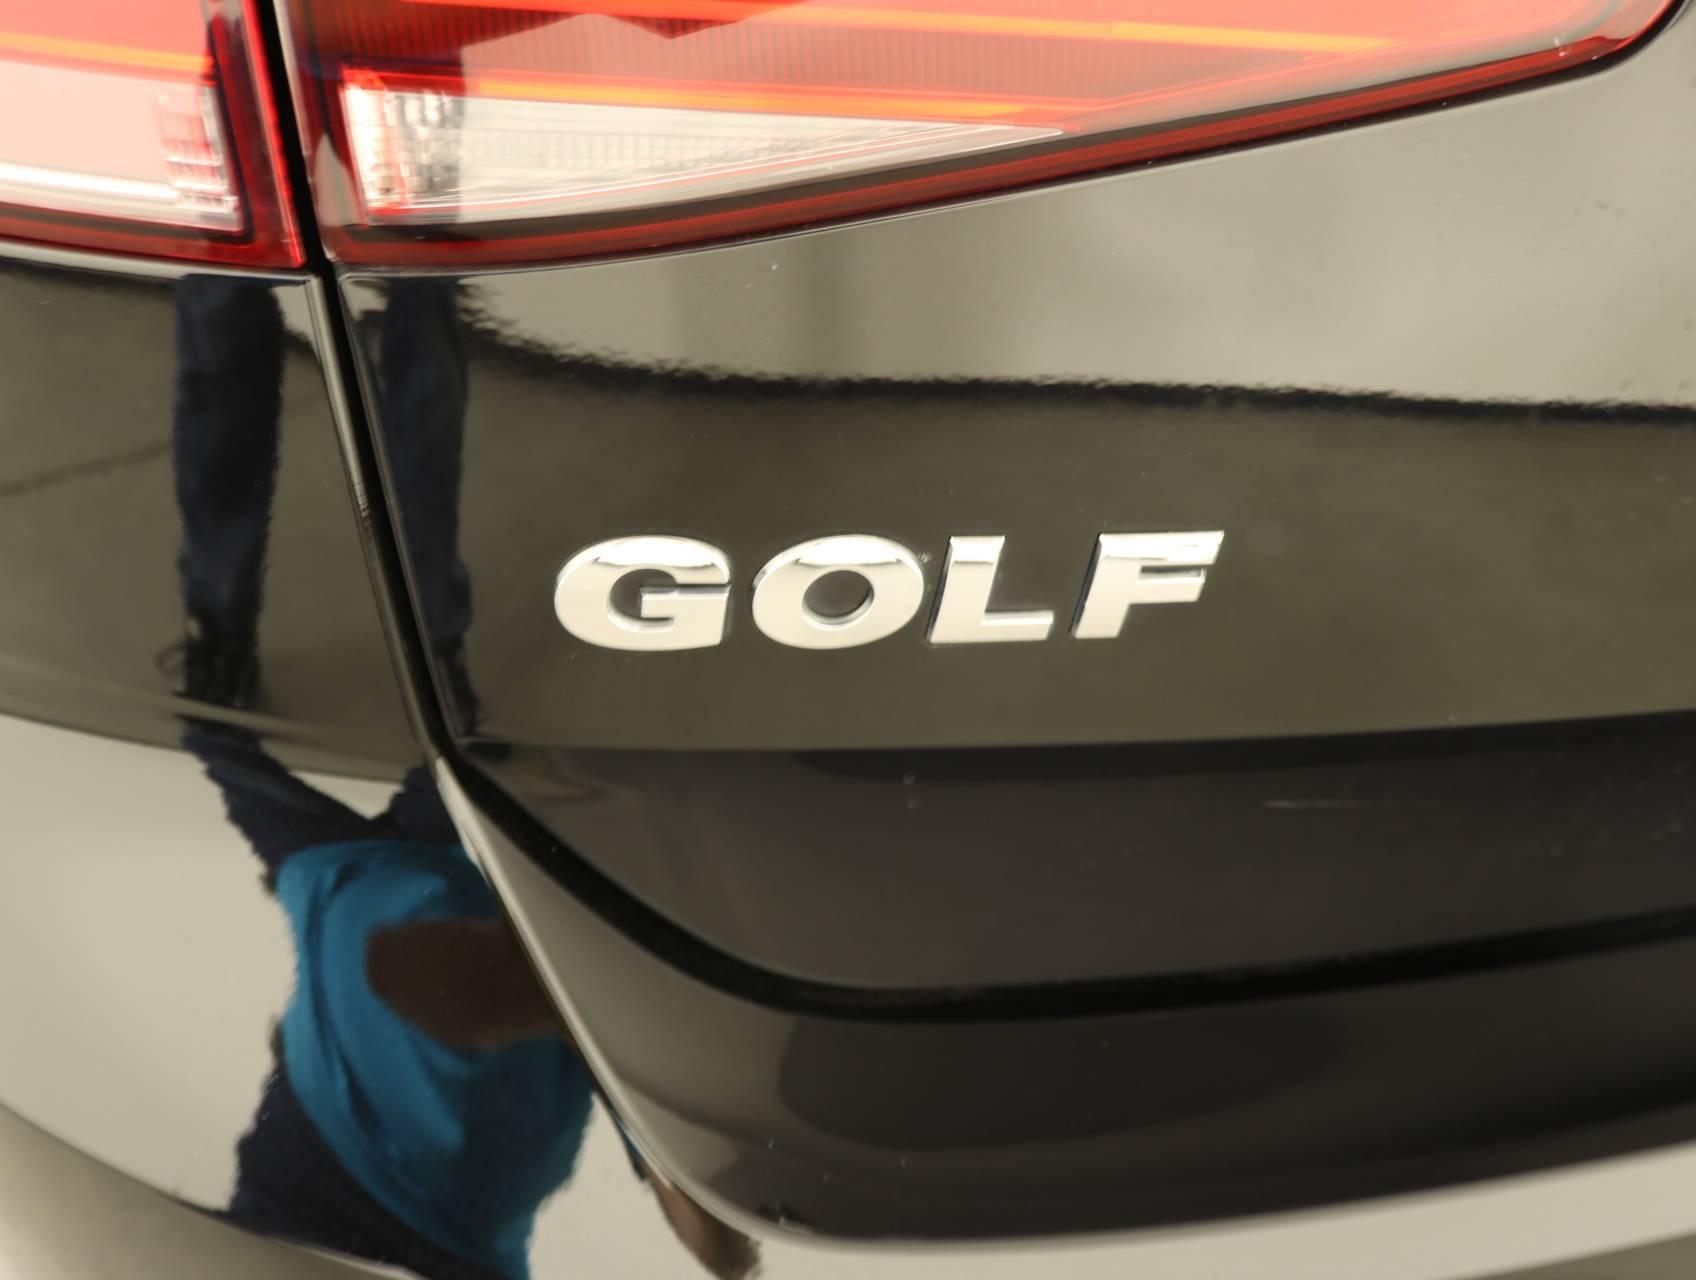 used vehicle - Hatchback VOLKSWAGEN GOLF 2017